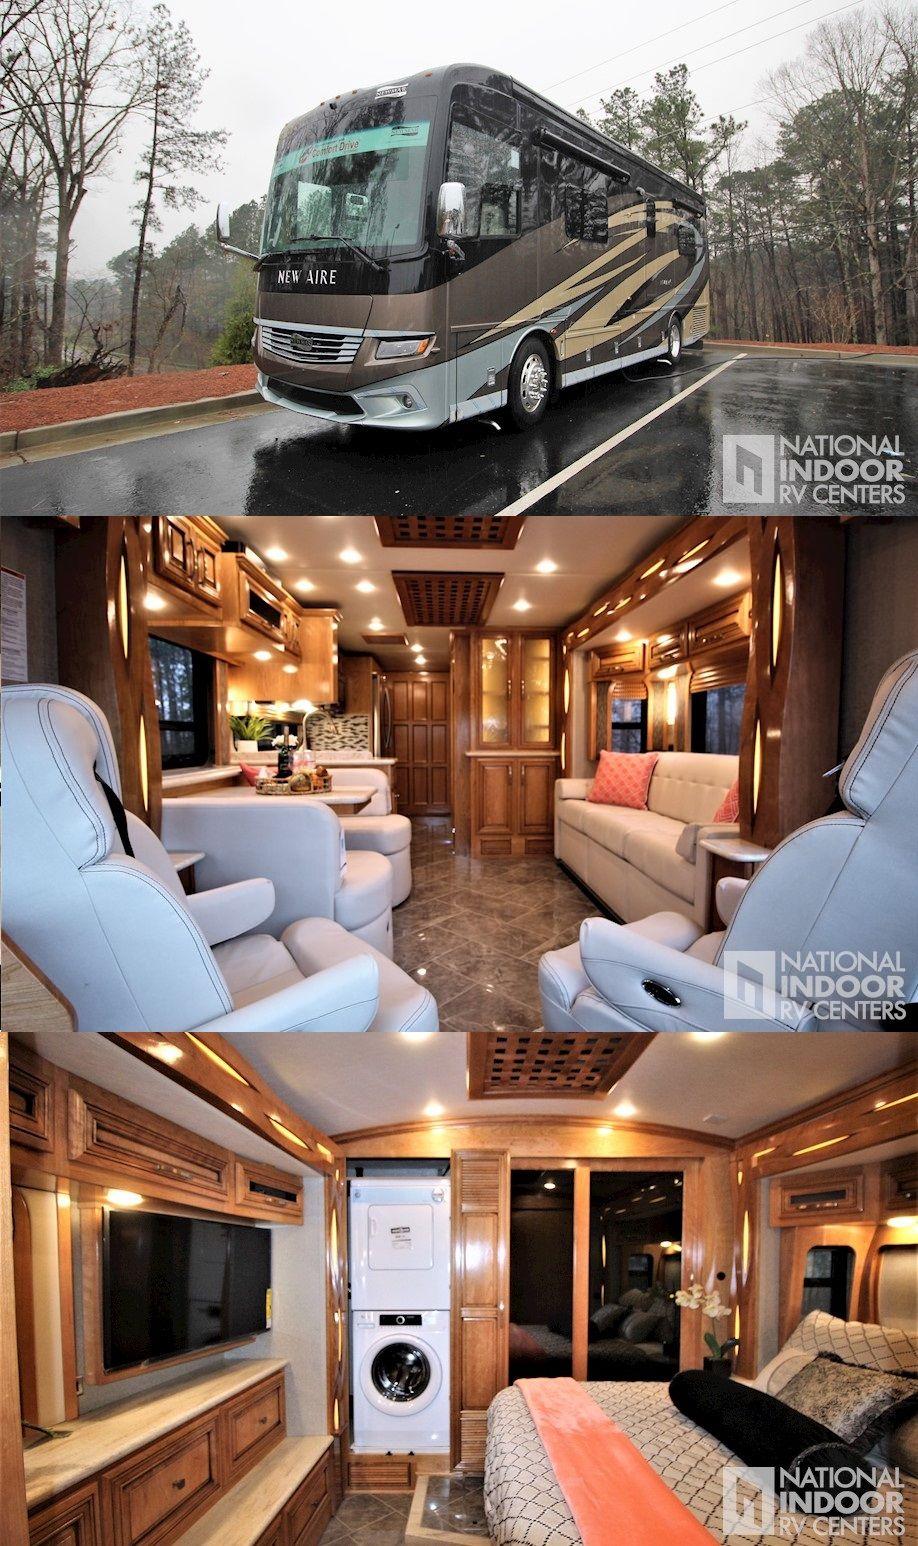 2018 Newmar New Aire 3343 Luxury Rv Living Luxury Motorhomes Luxury Rv